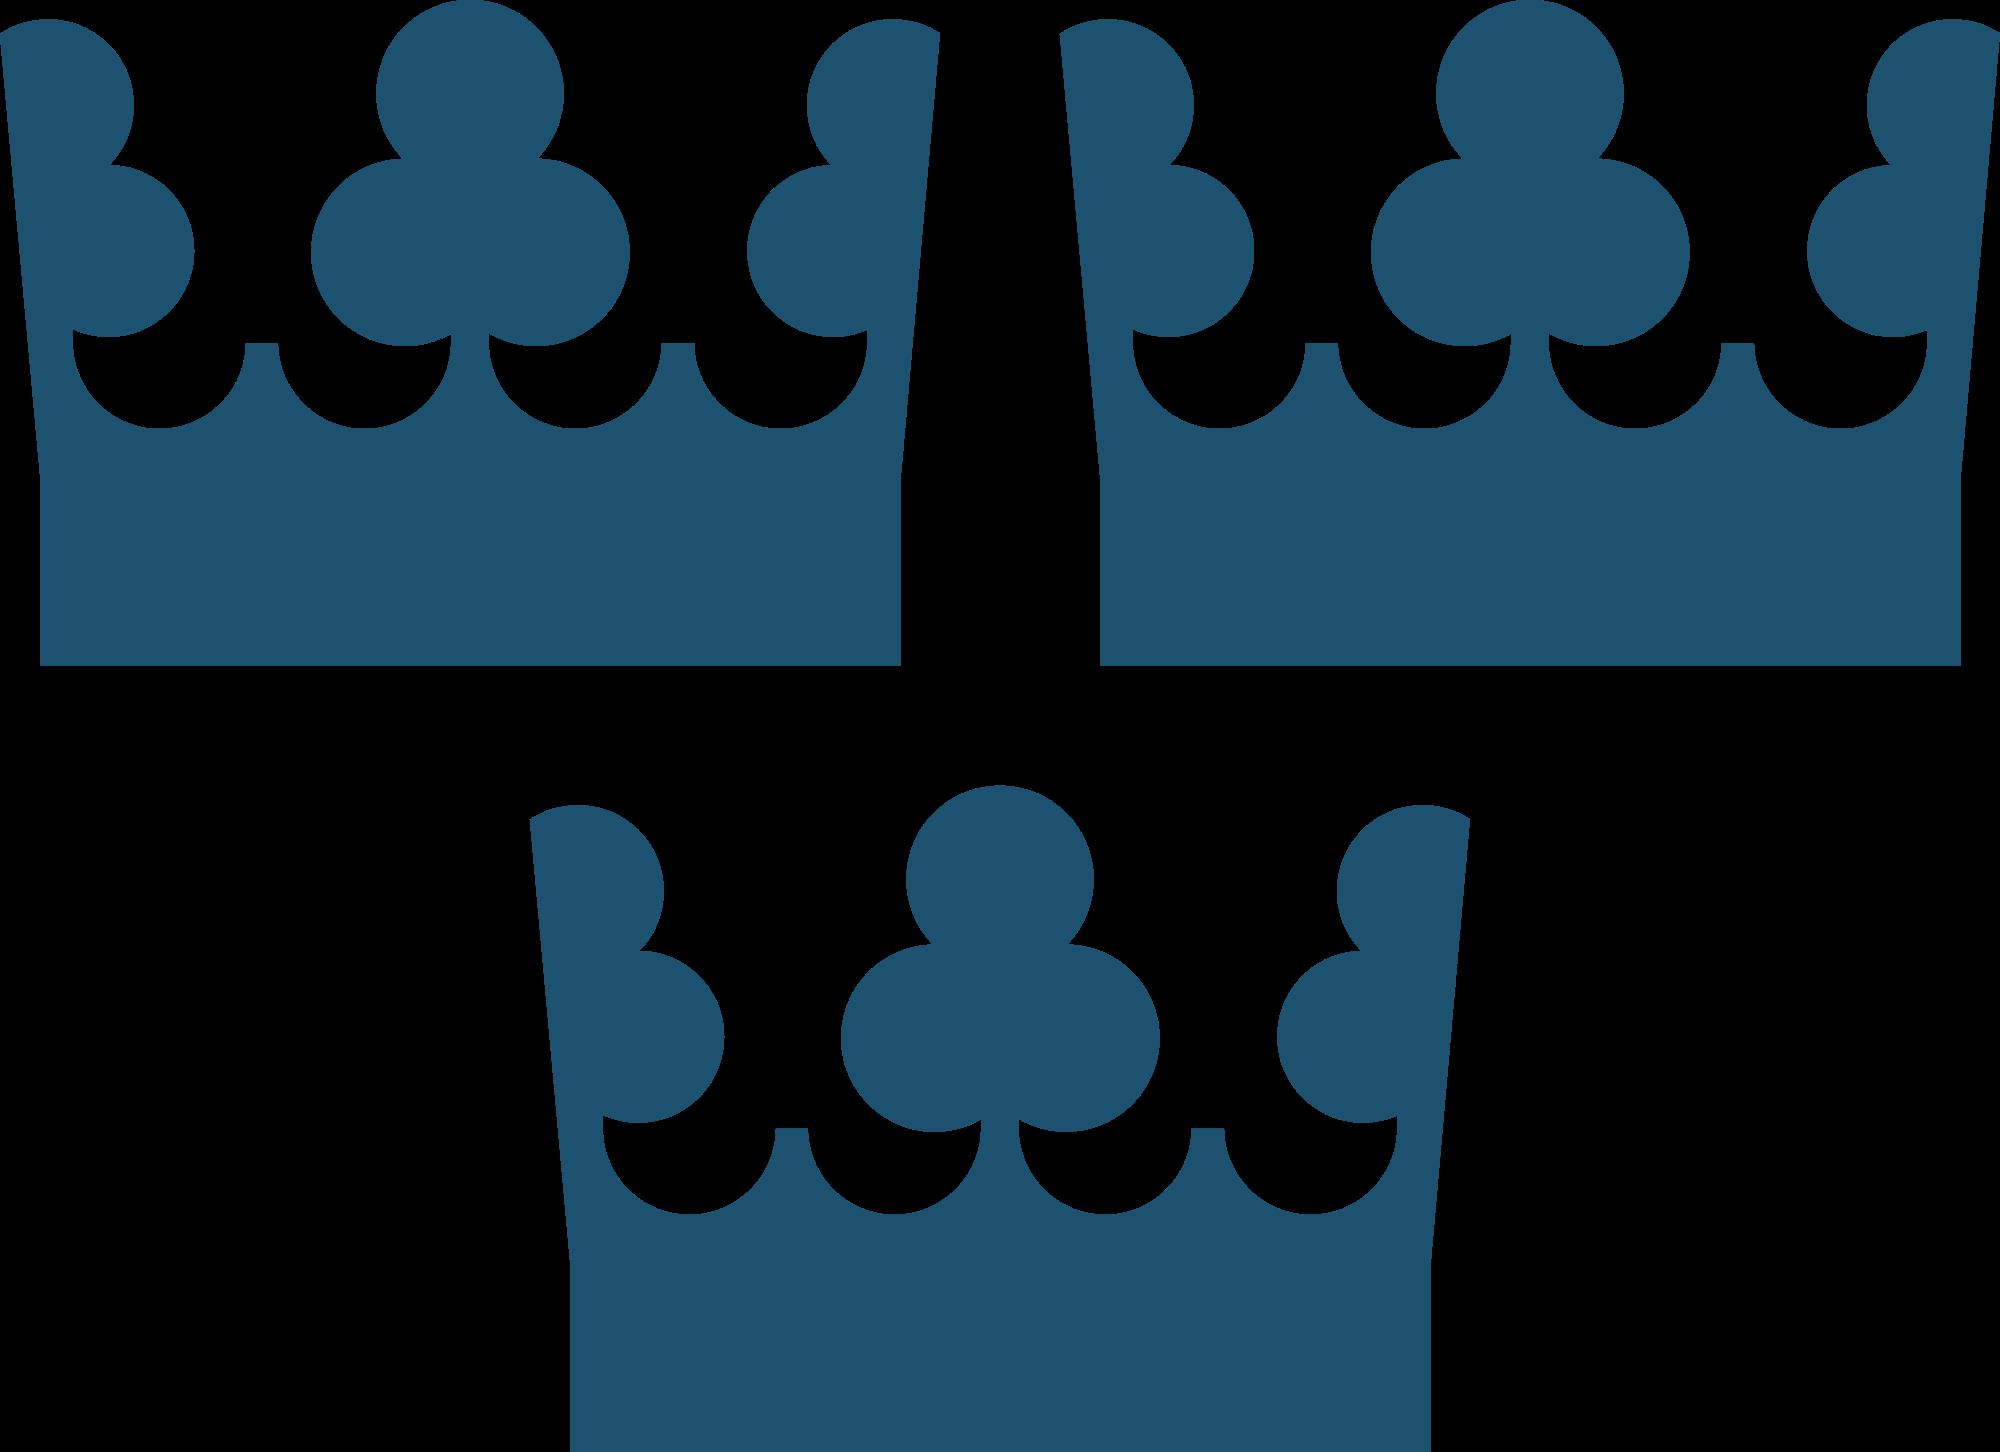 Герб Шведского Парламента